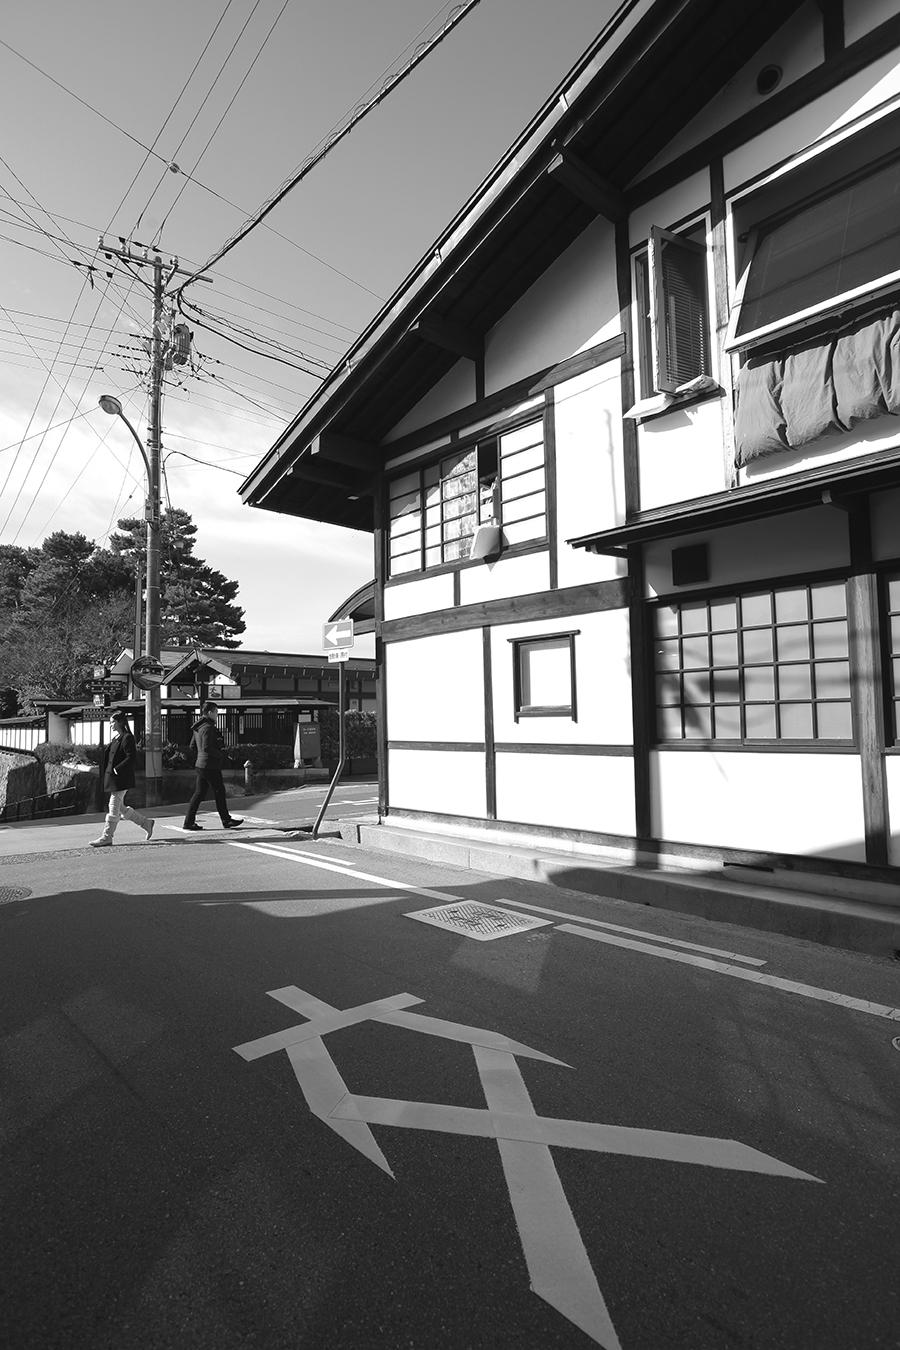 shirakawago japan . pre-wedding photography by kurt ahs . terry+zoey . 4244.jpg